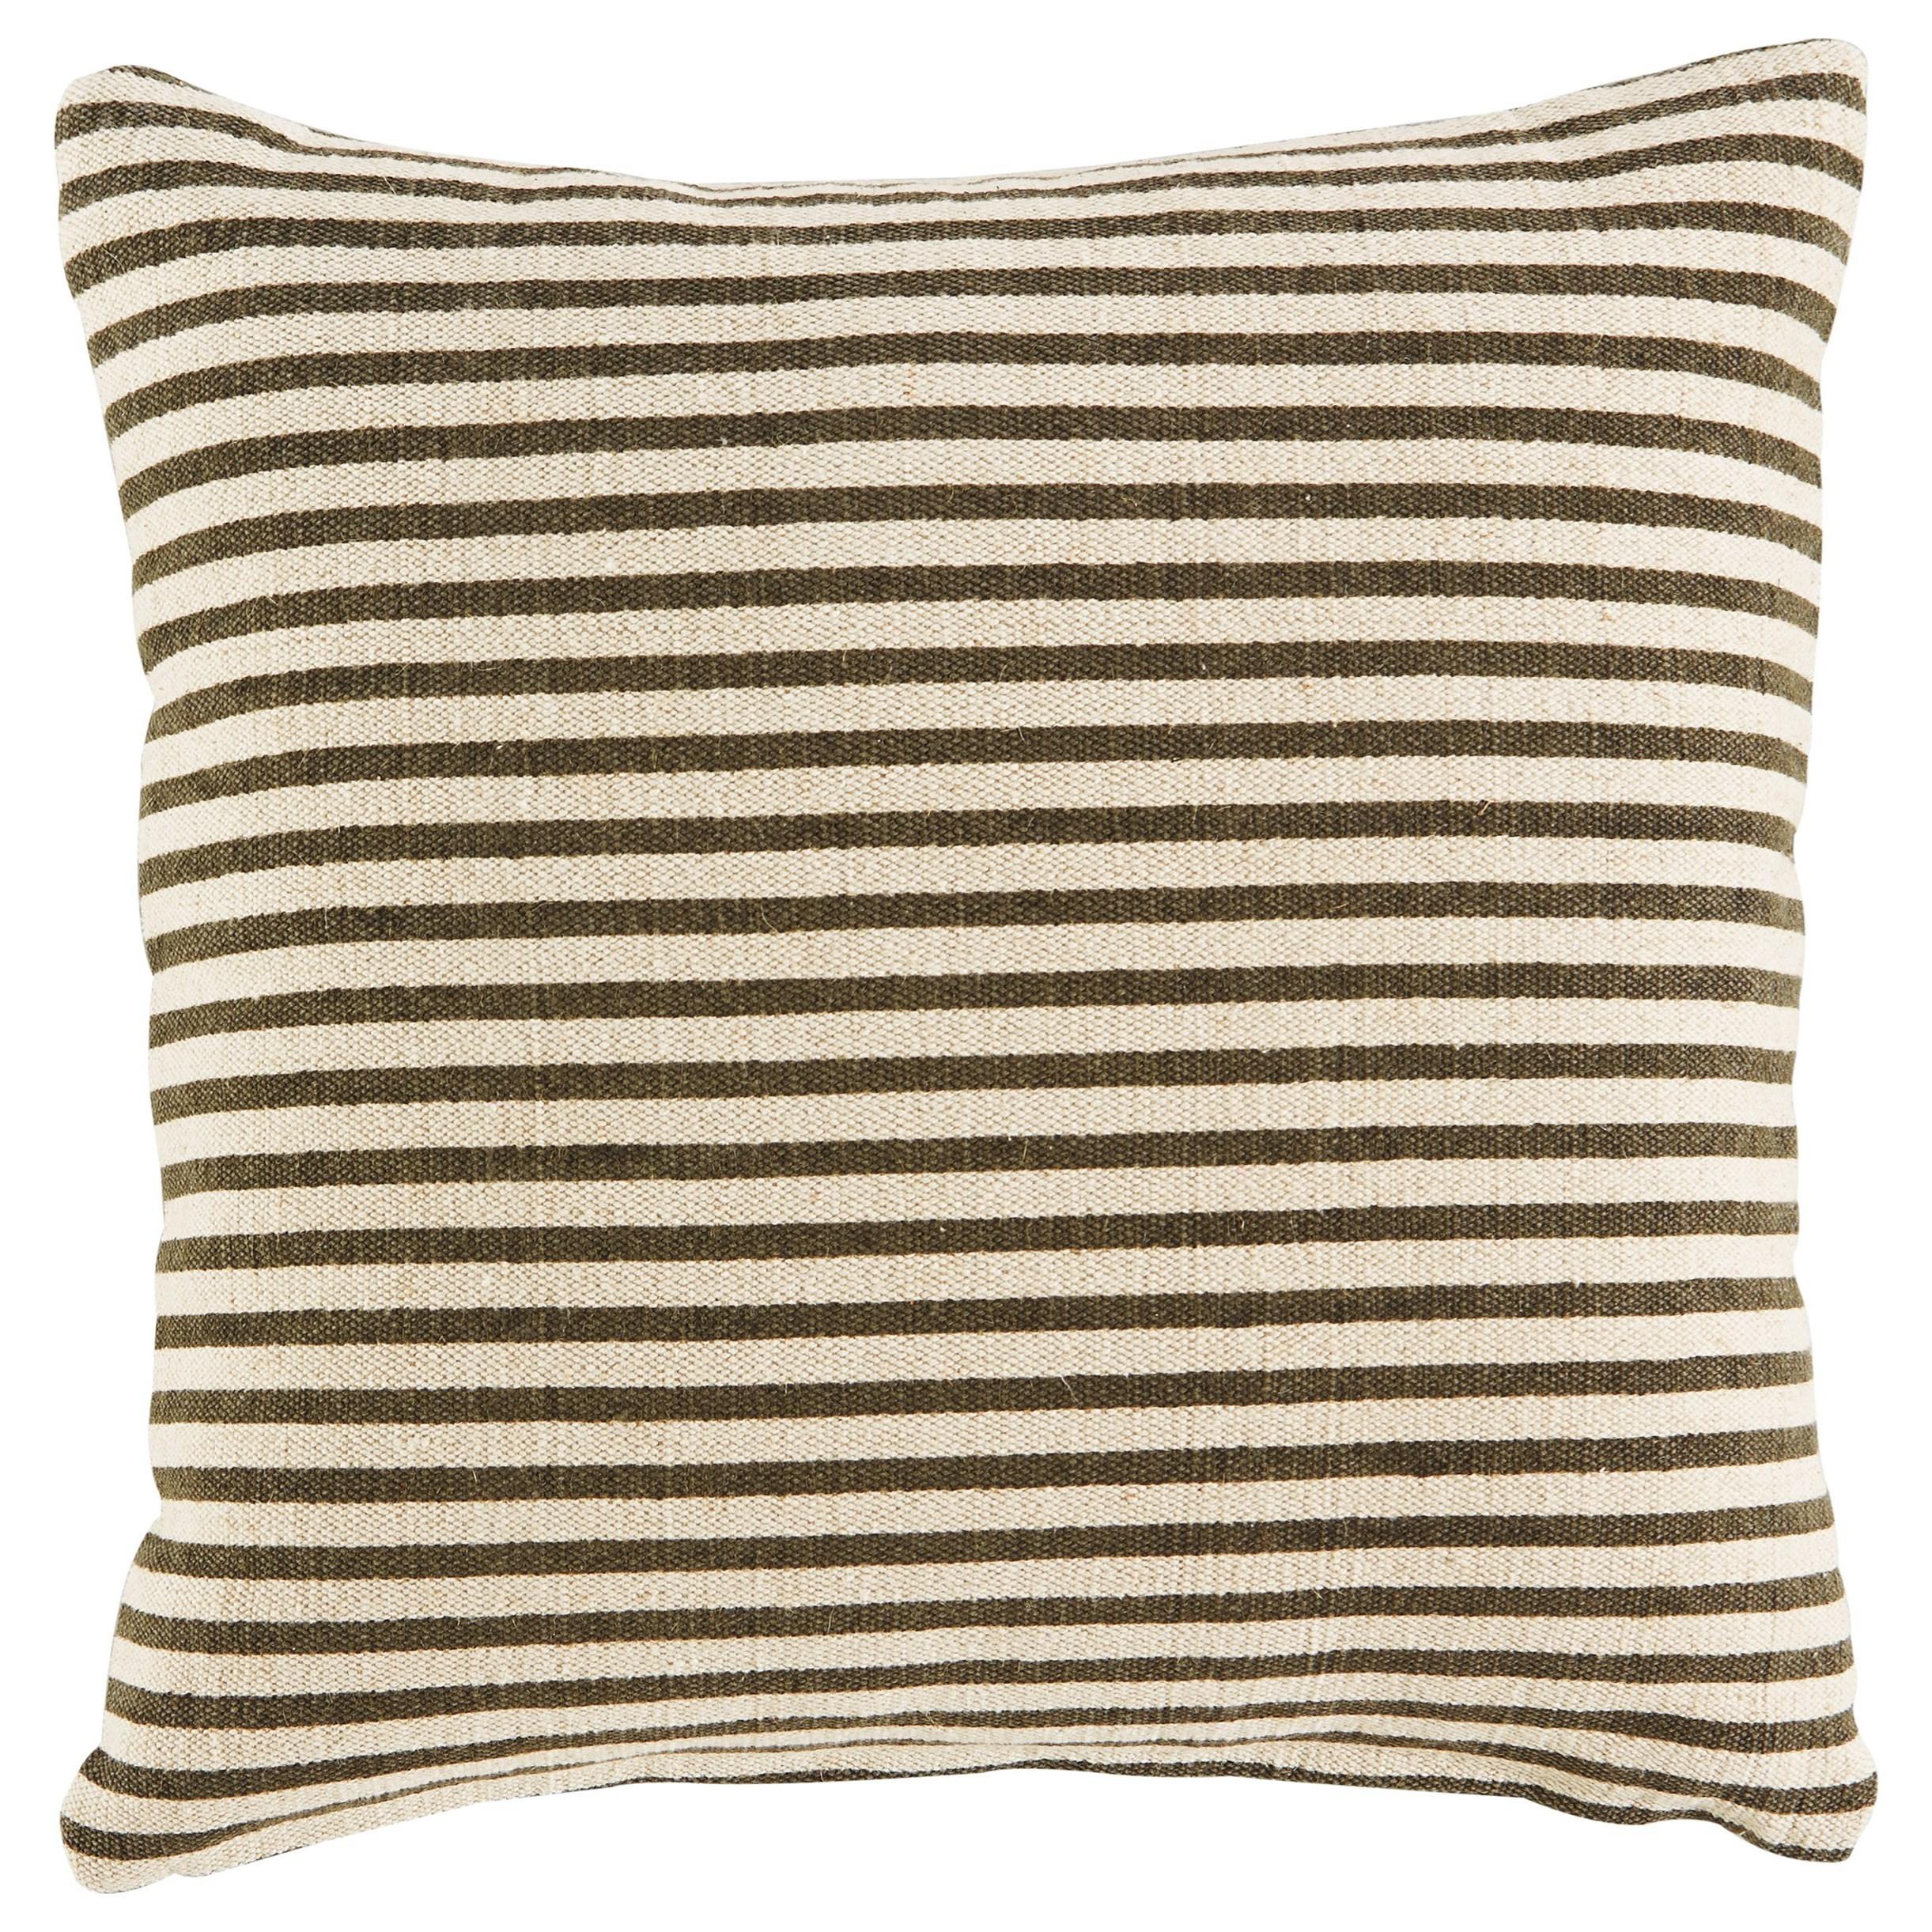 Yates Natural/Brown Pillow